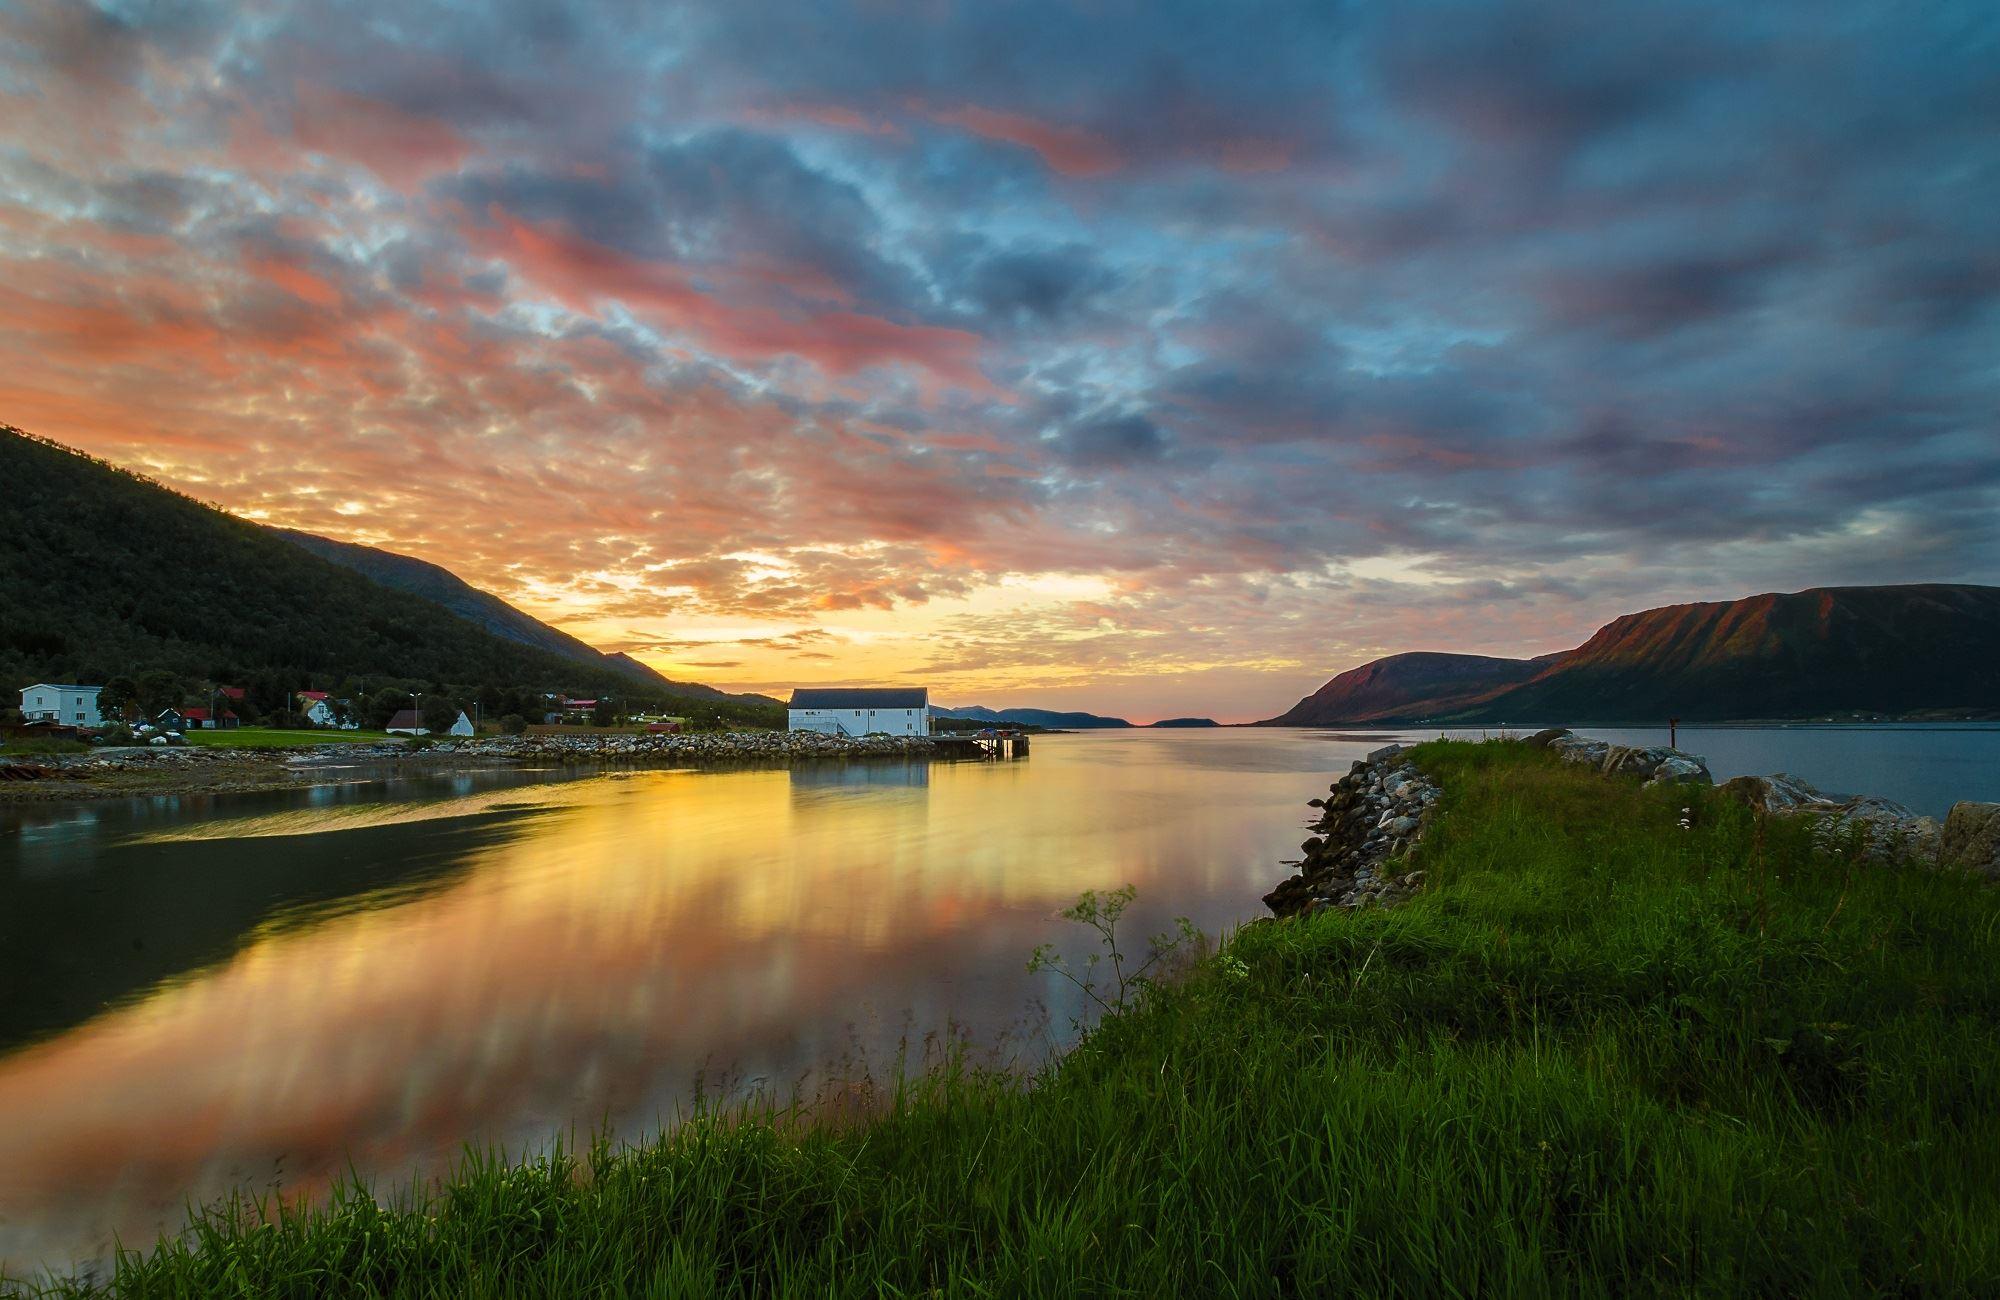 Ragnahuset - Andøy fjordfiske